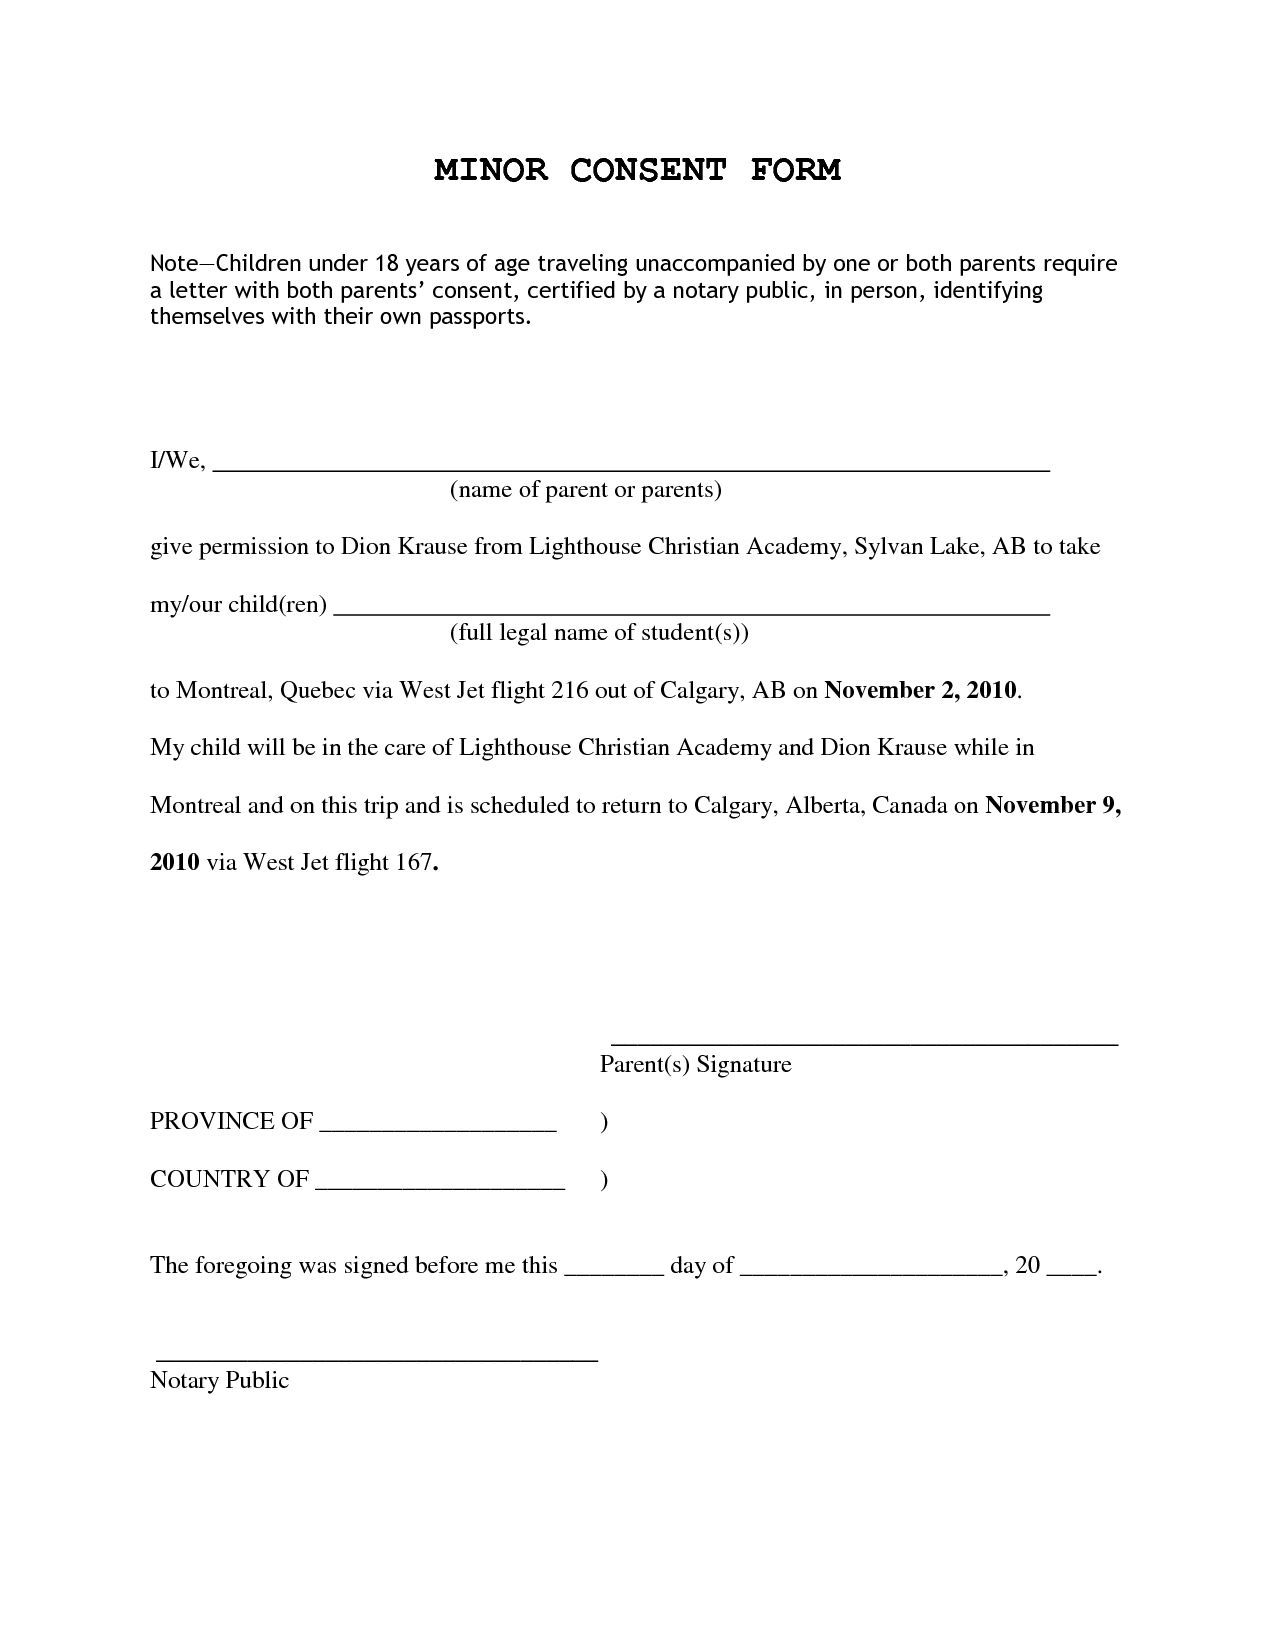 Consent Permission Inside Letter For Children Travelling